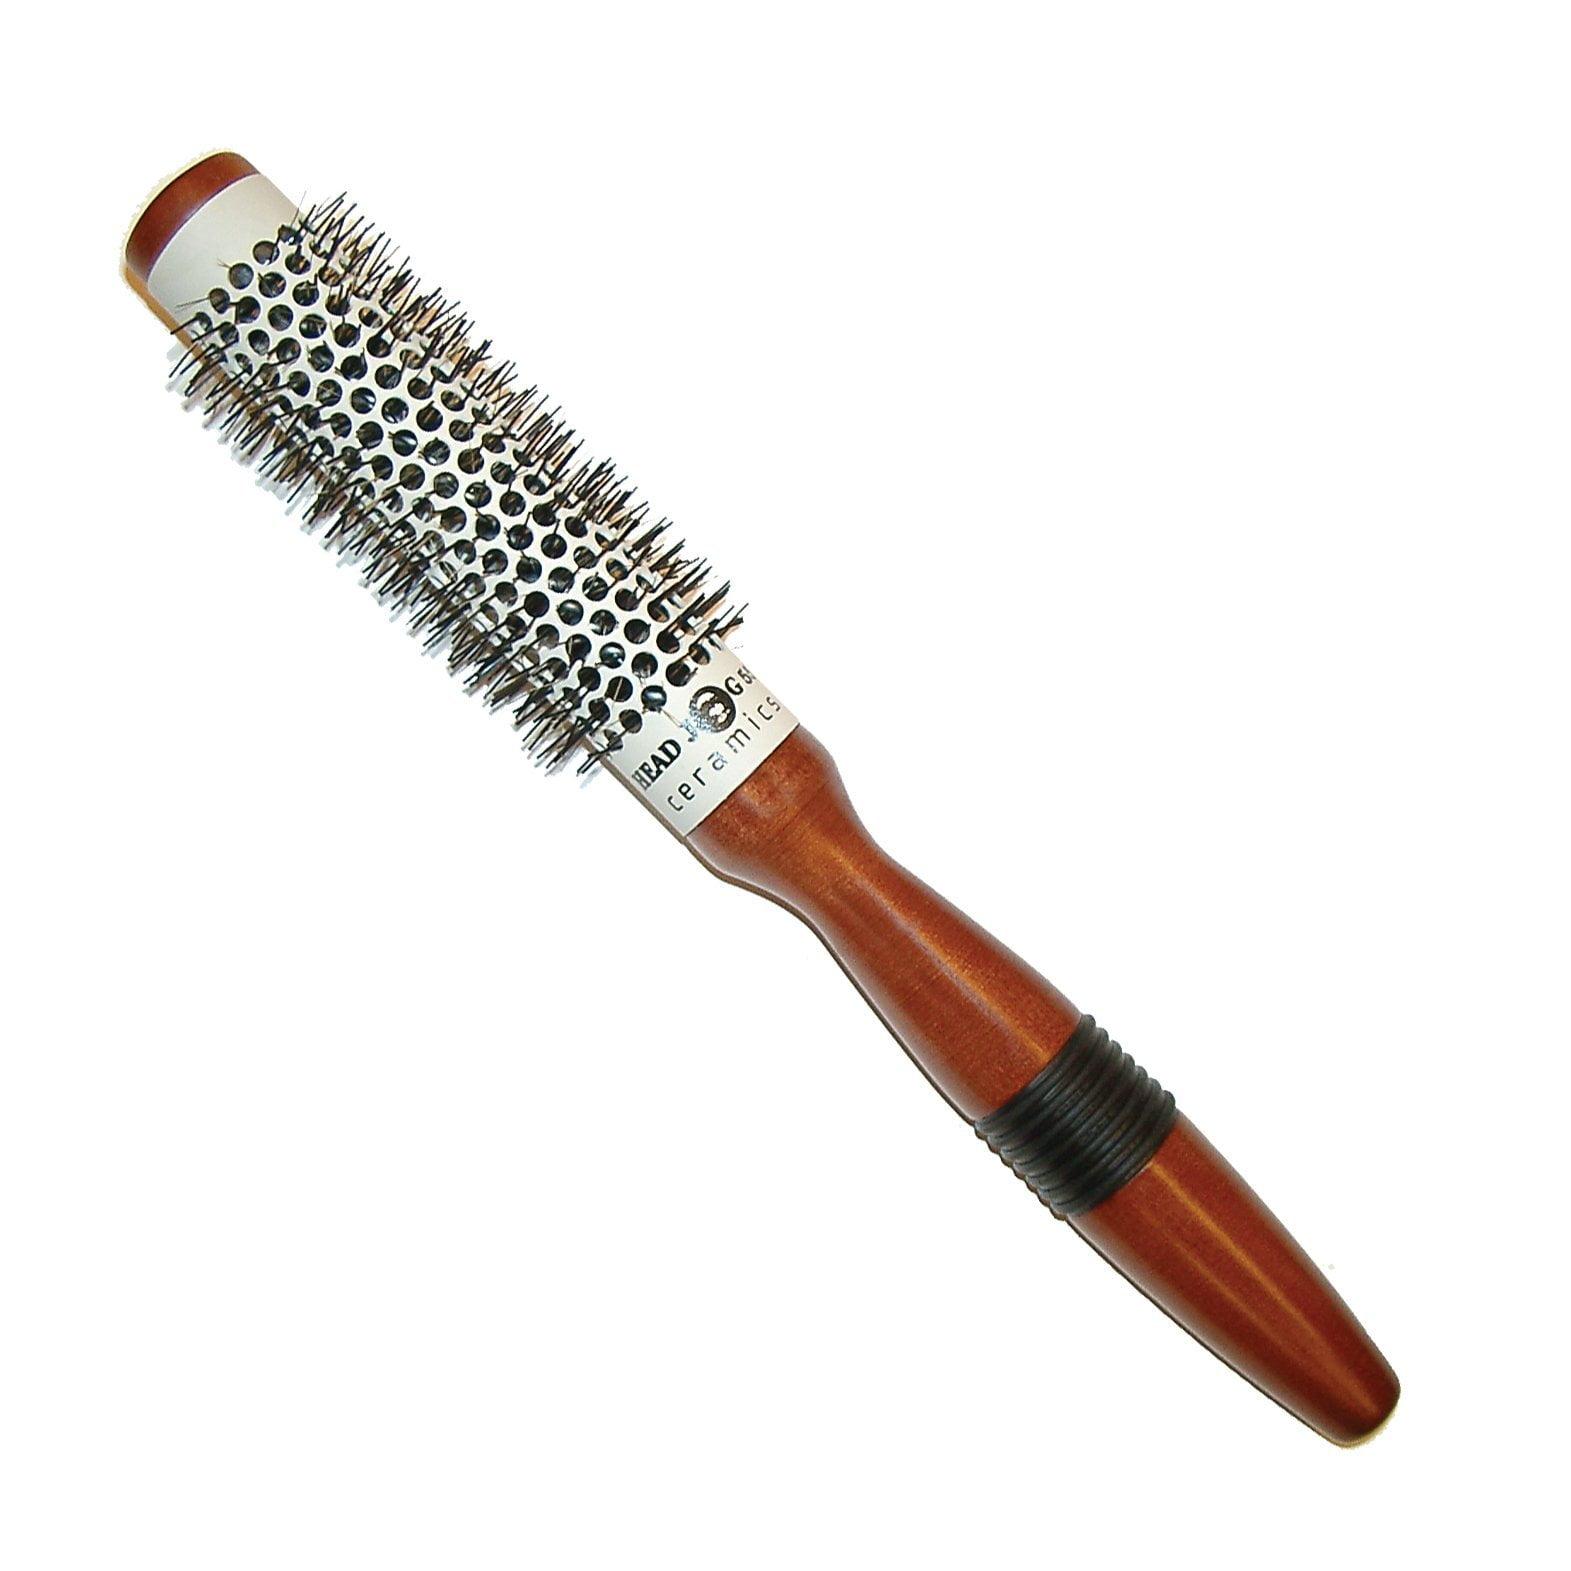 Head Jog 55 - 25mm Ceramic Wooden Radial Brush